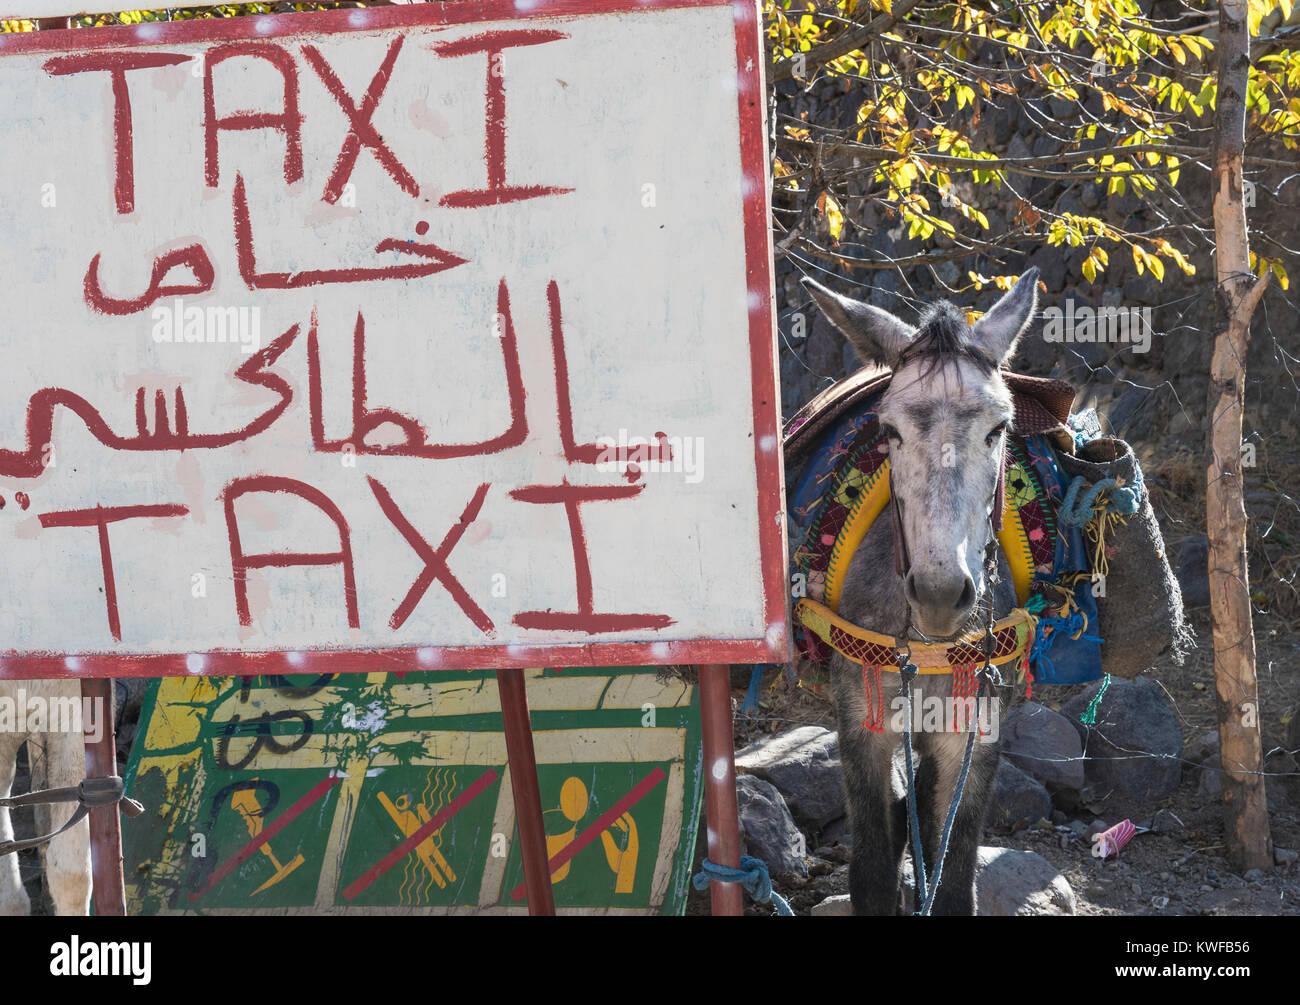 Mule Taxi carteles, Imlil, el Alto Atlas. Imagen De Stock